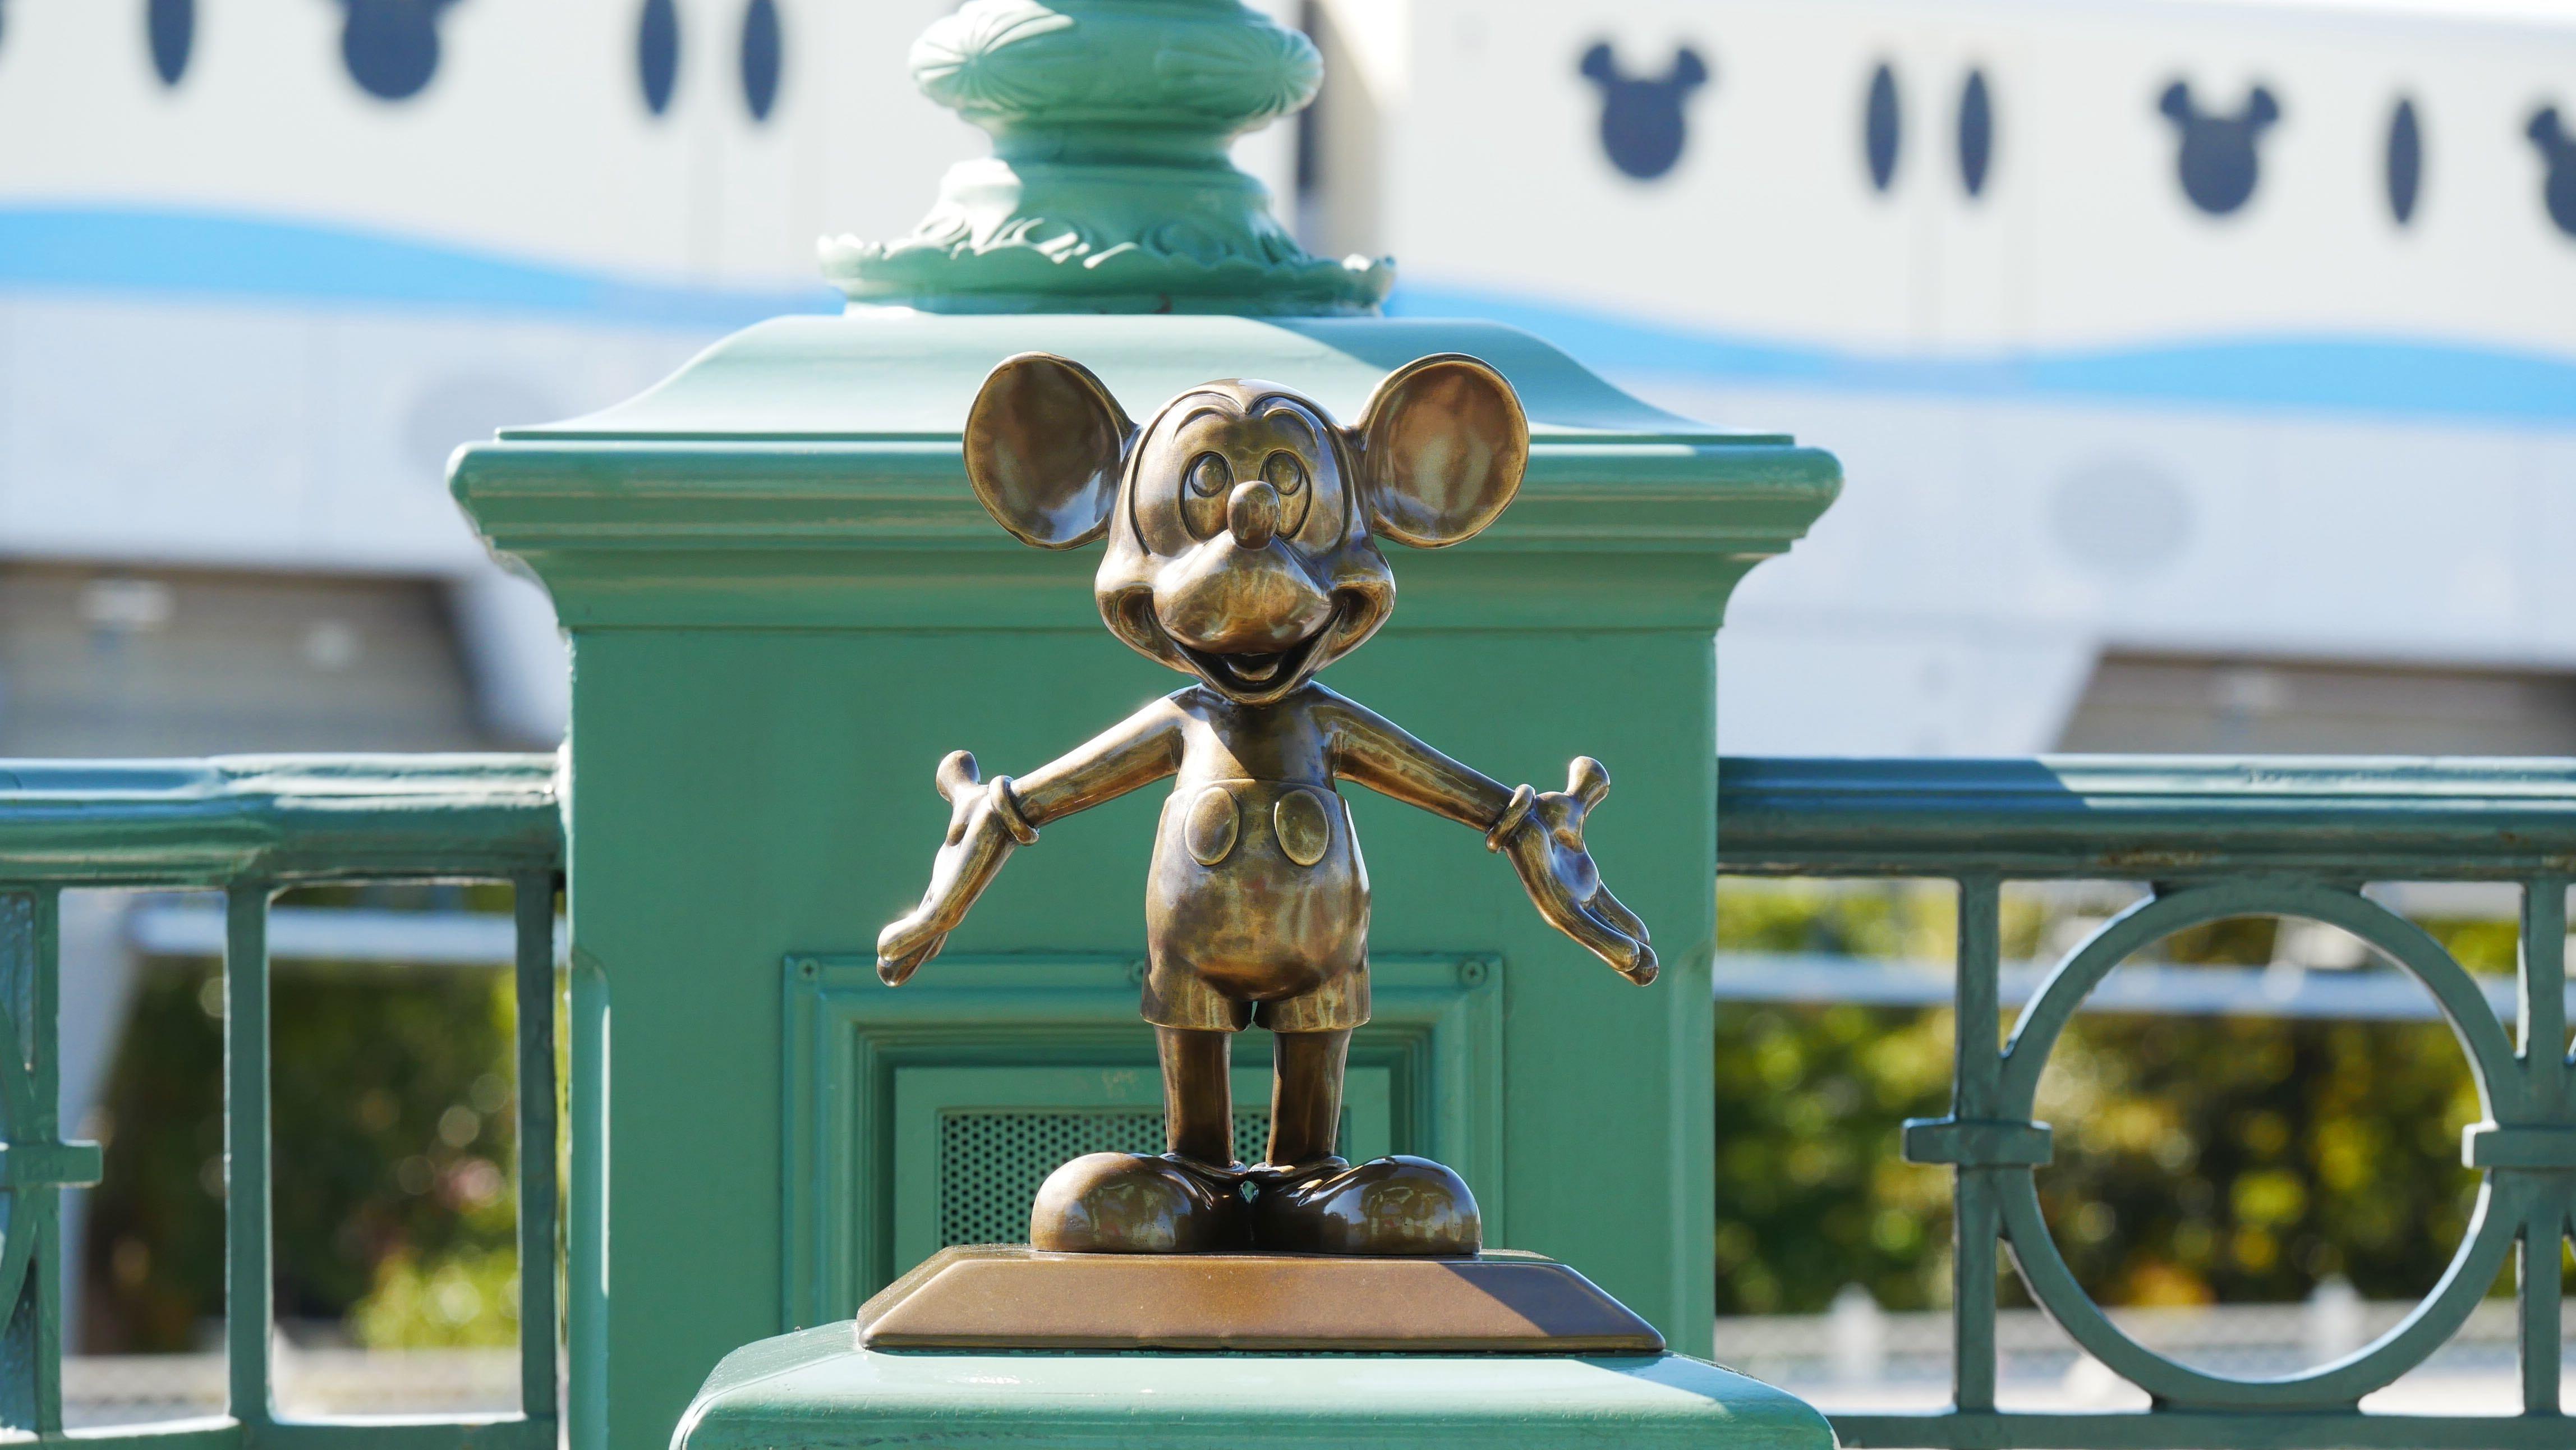 Tokyo Disneyland Mickey Statue